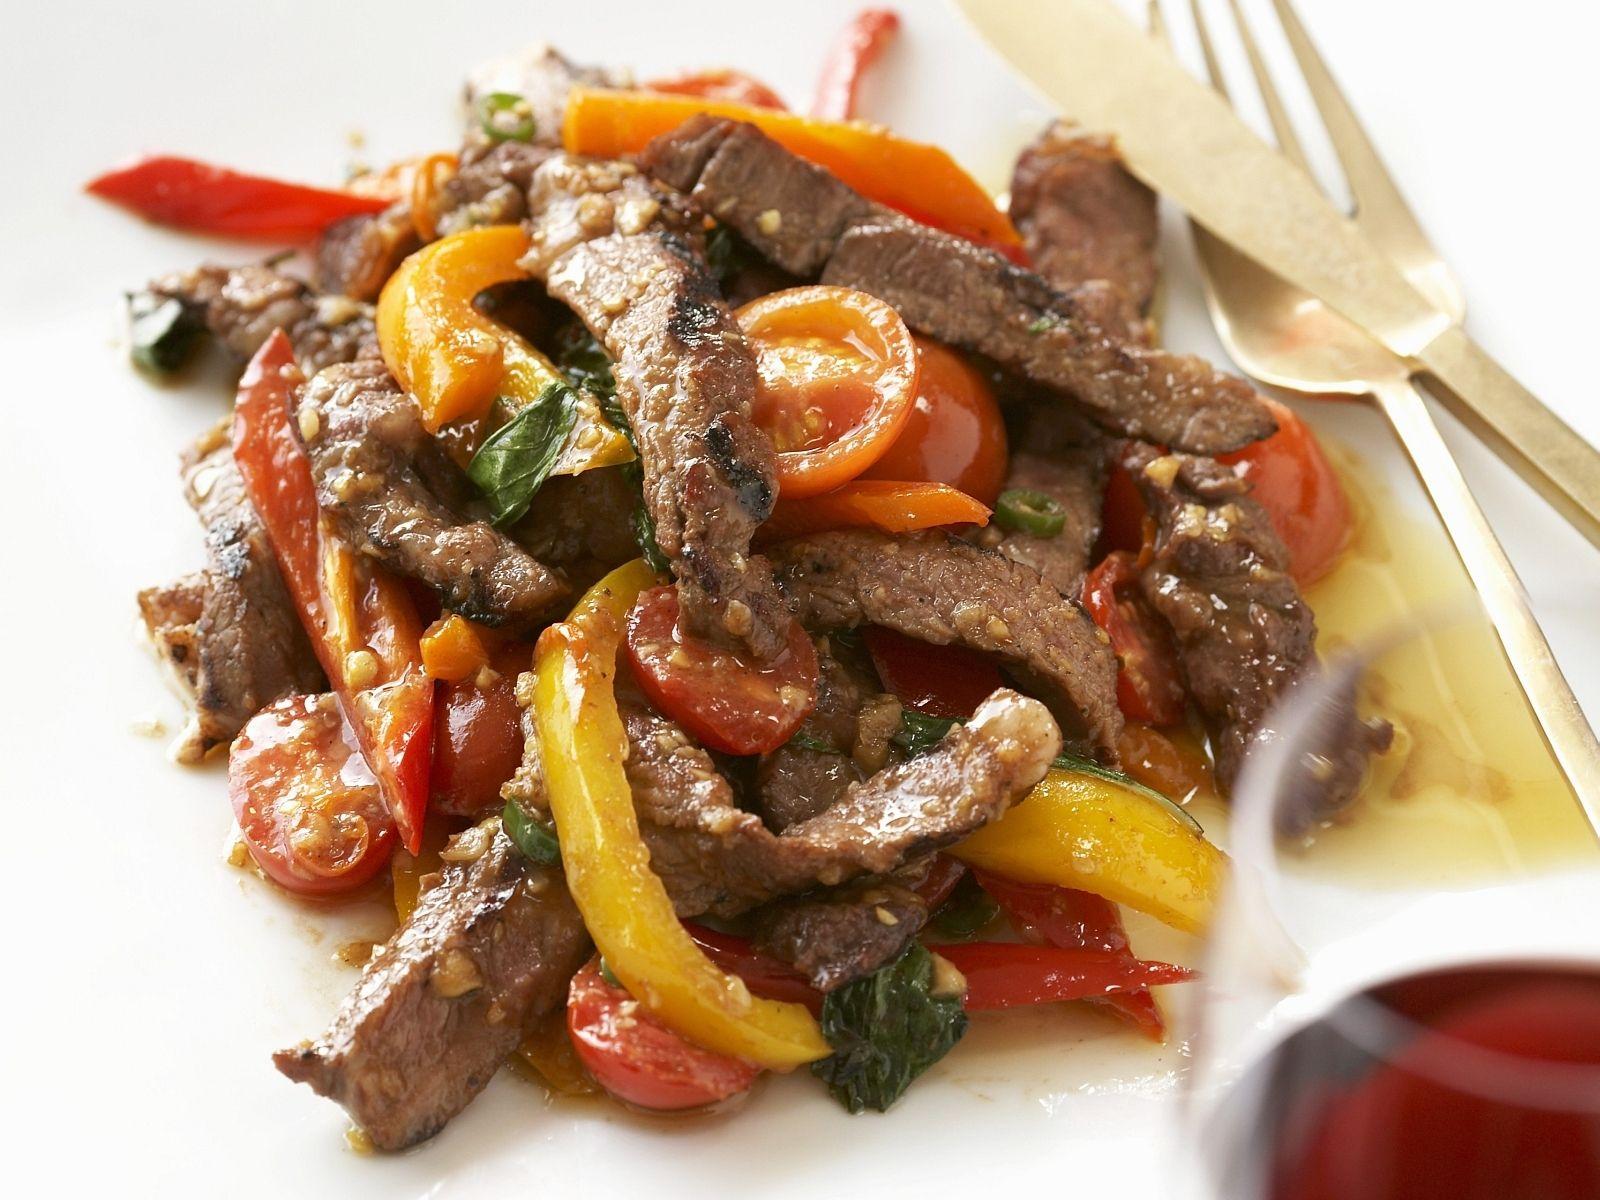 Geschnetzeltes vom Rind mit Paprika - smarter - Kalorien: 320 Kcal - Zeit: 30 Min. | eatsmarter.de